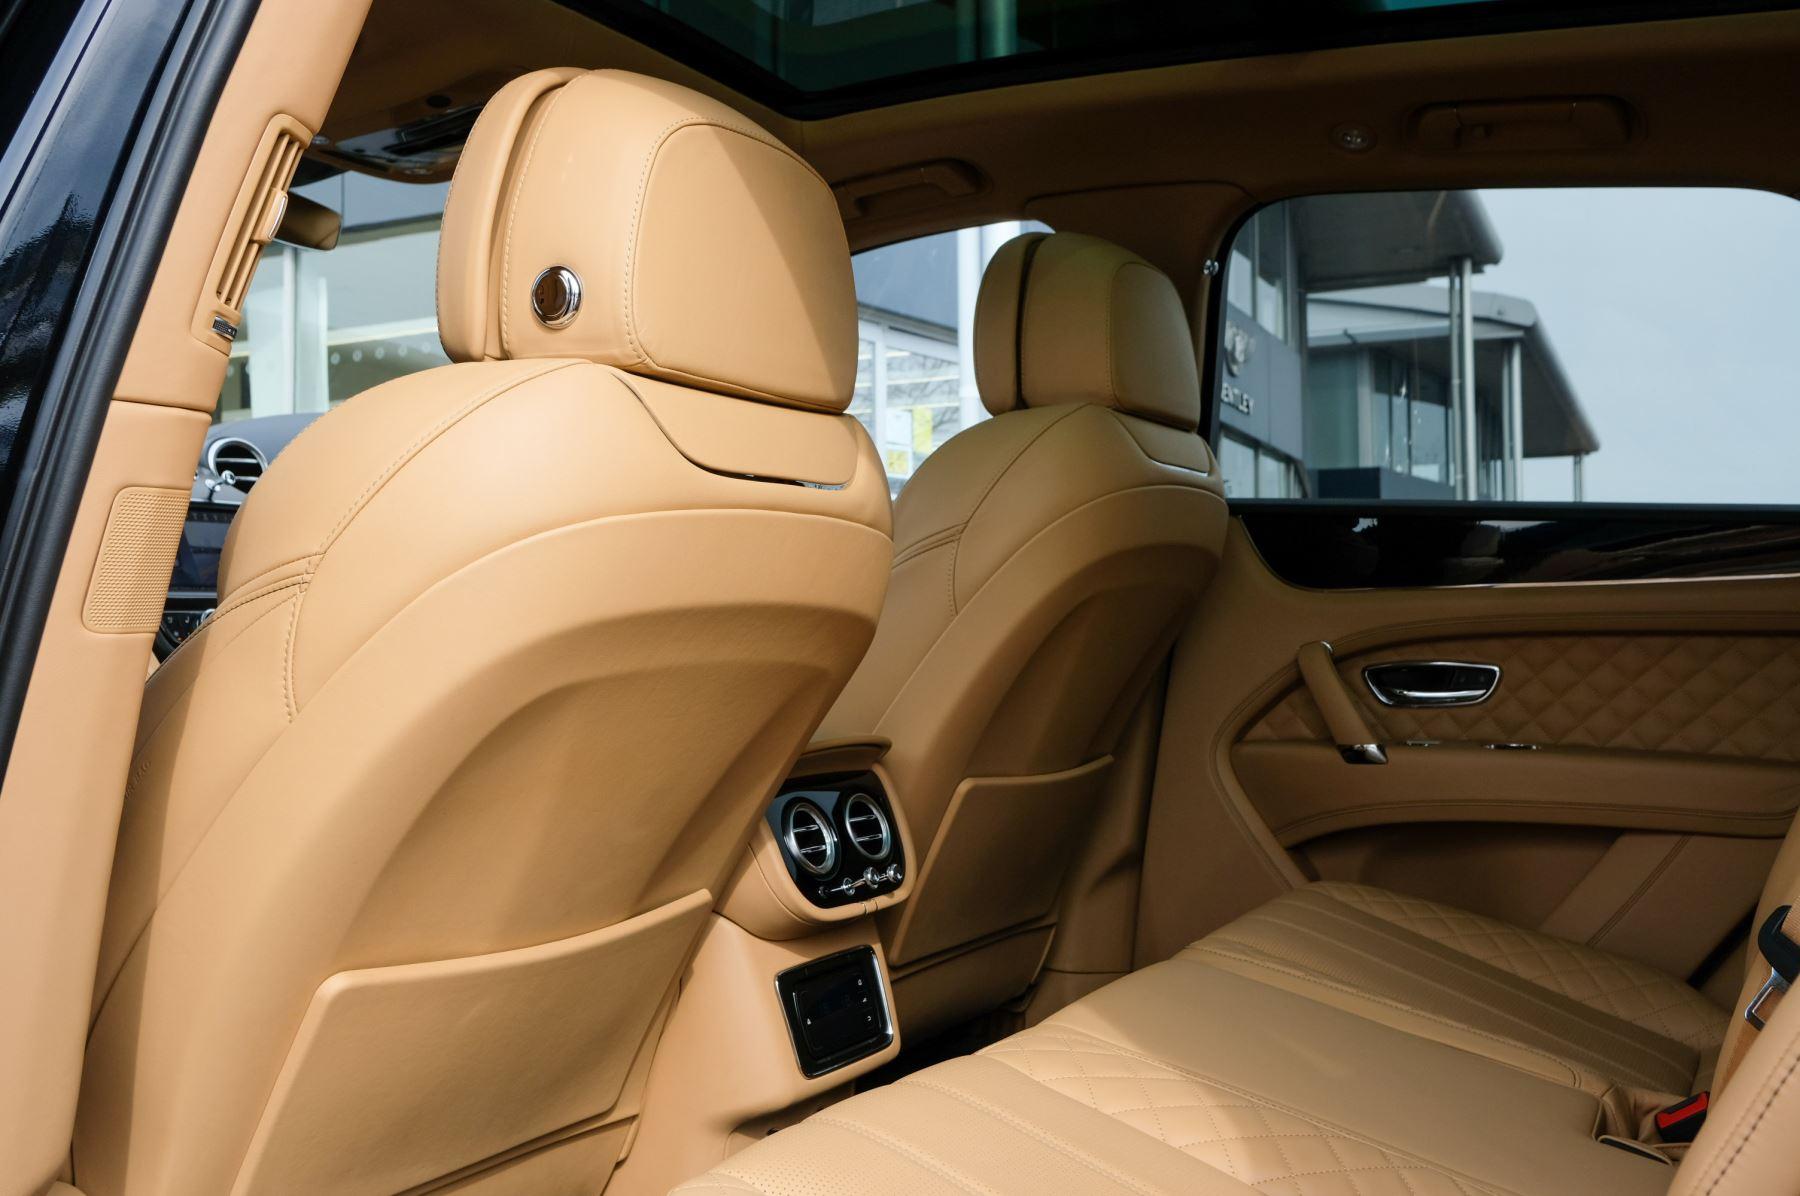 Bentley Bentayga 6.0 W12 5dr - Mulliner Driving Specification  image 14